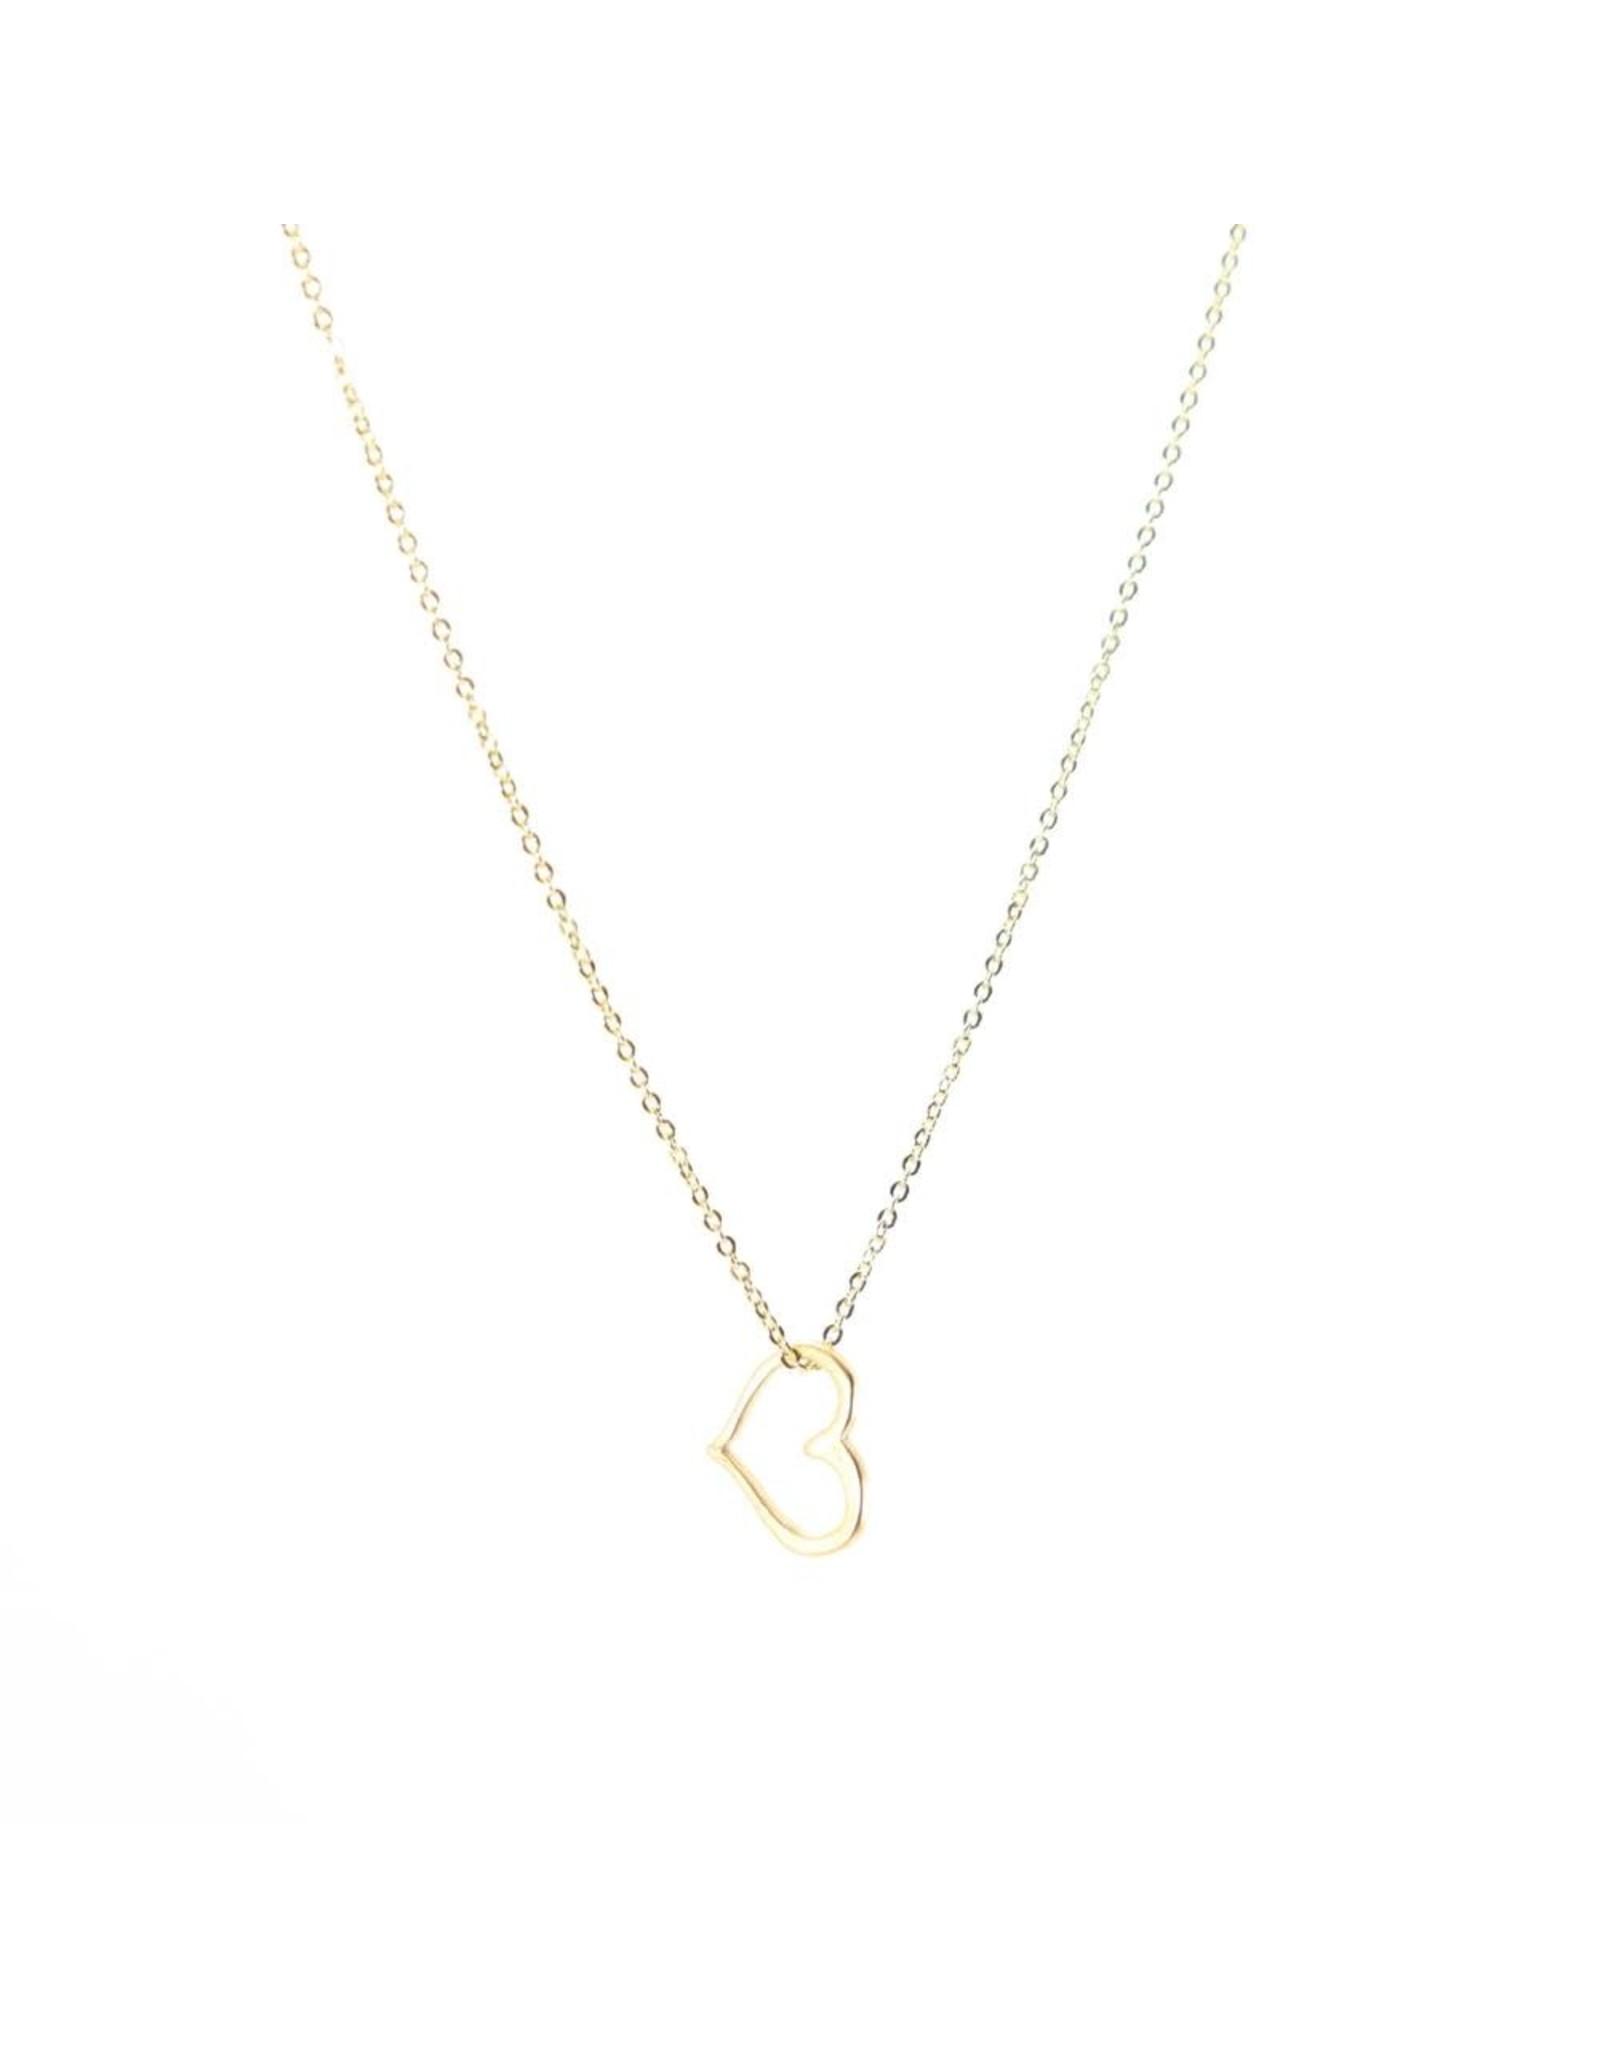 BB Lila Heart N Soul Necklace